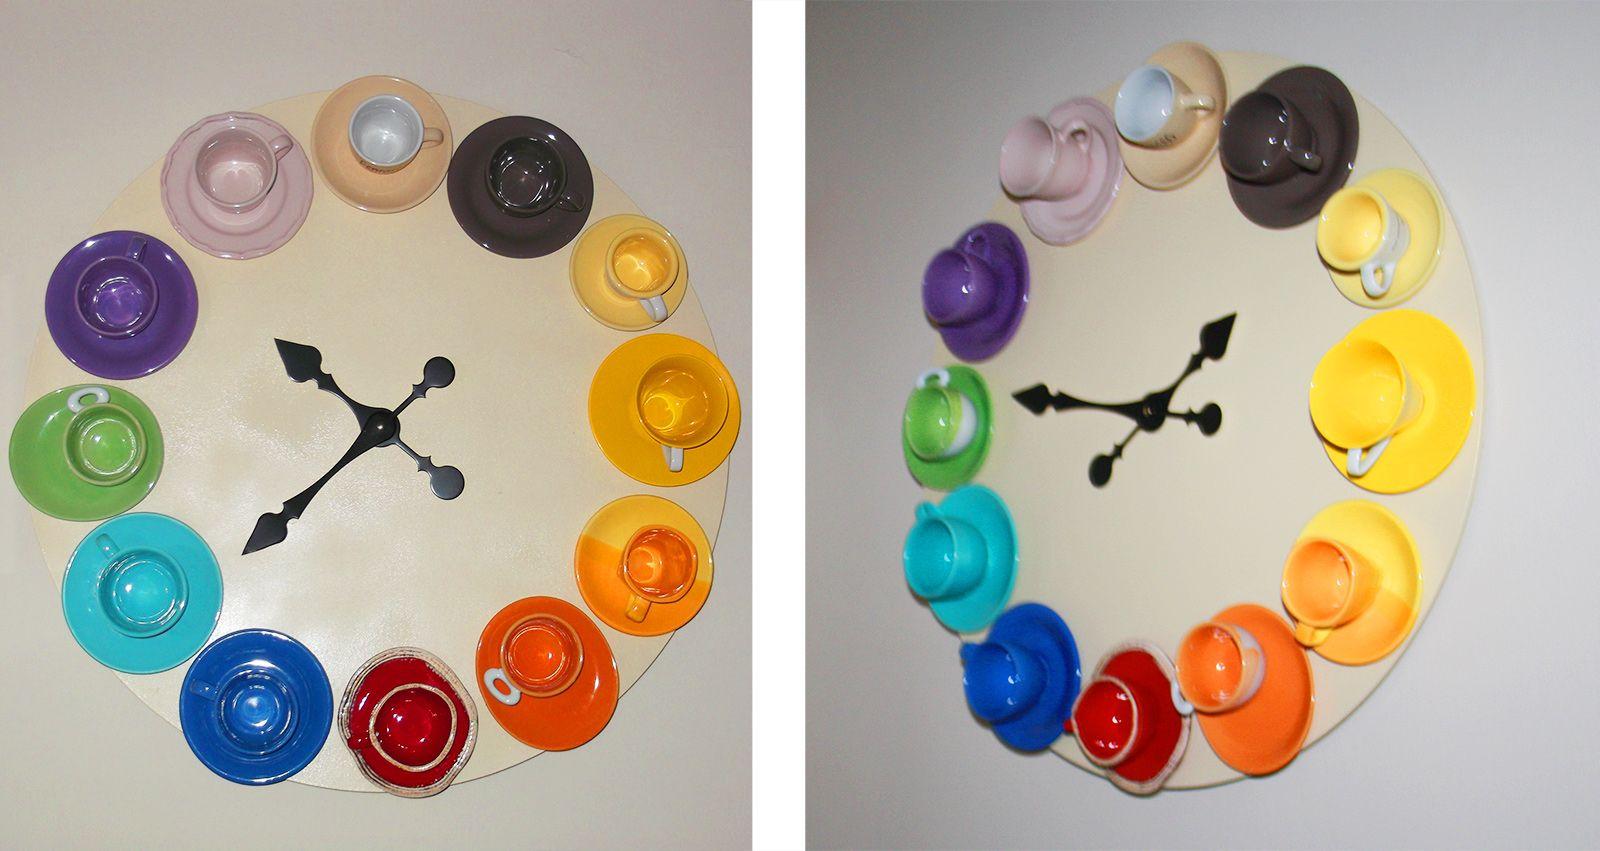 Awesome Orologi Da Parete Per Cucina Moderni Ideas - bakeroffroad ...